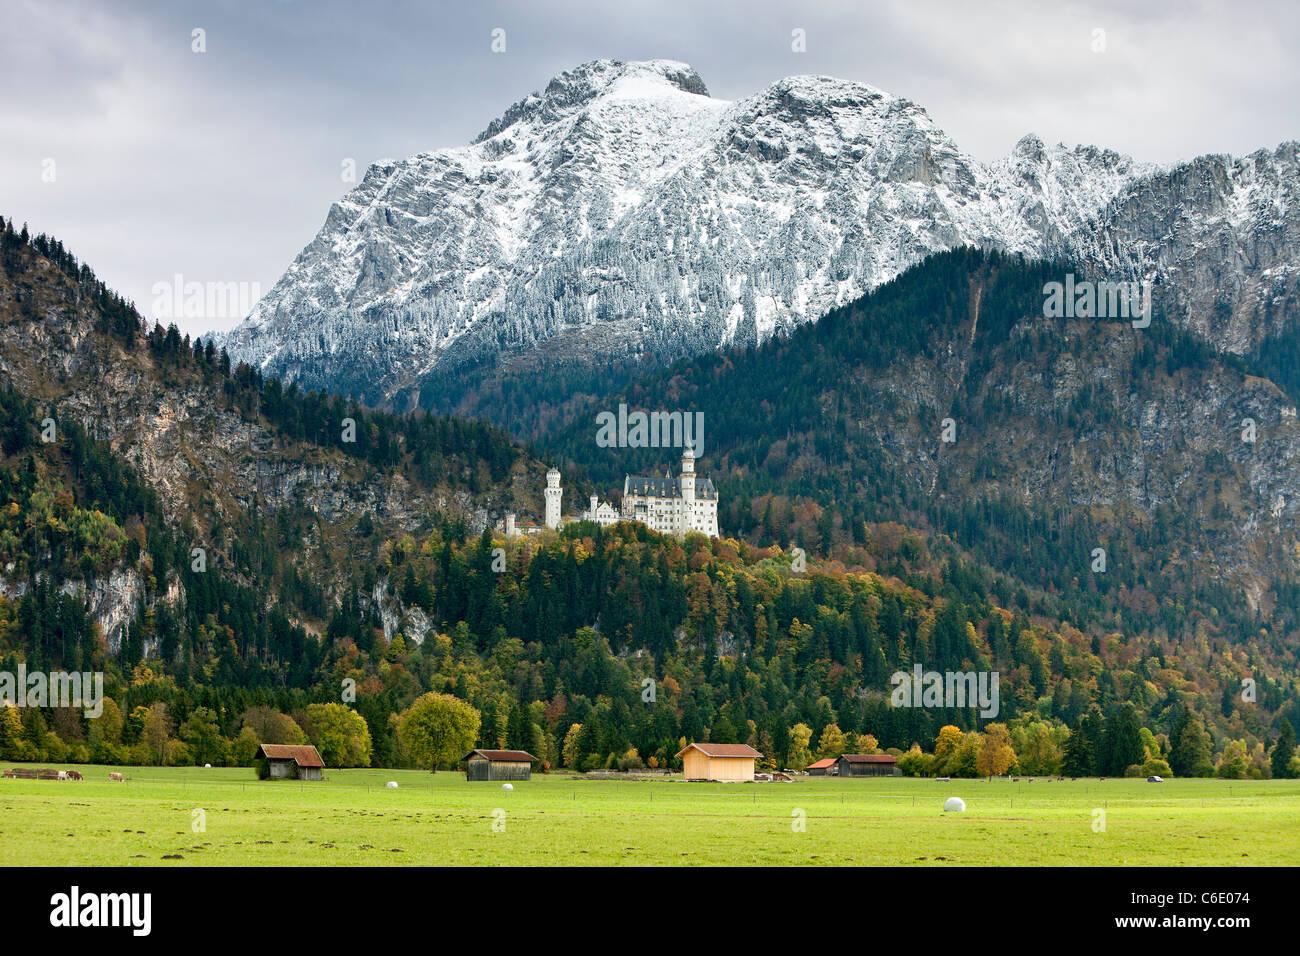 Neuschwanstein Castle, Bavaria, Germany, Europe - Stock Image